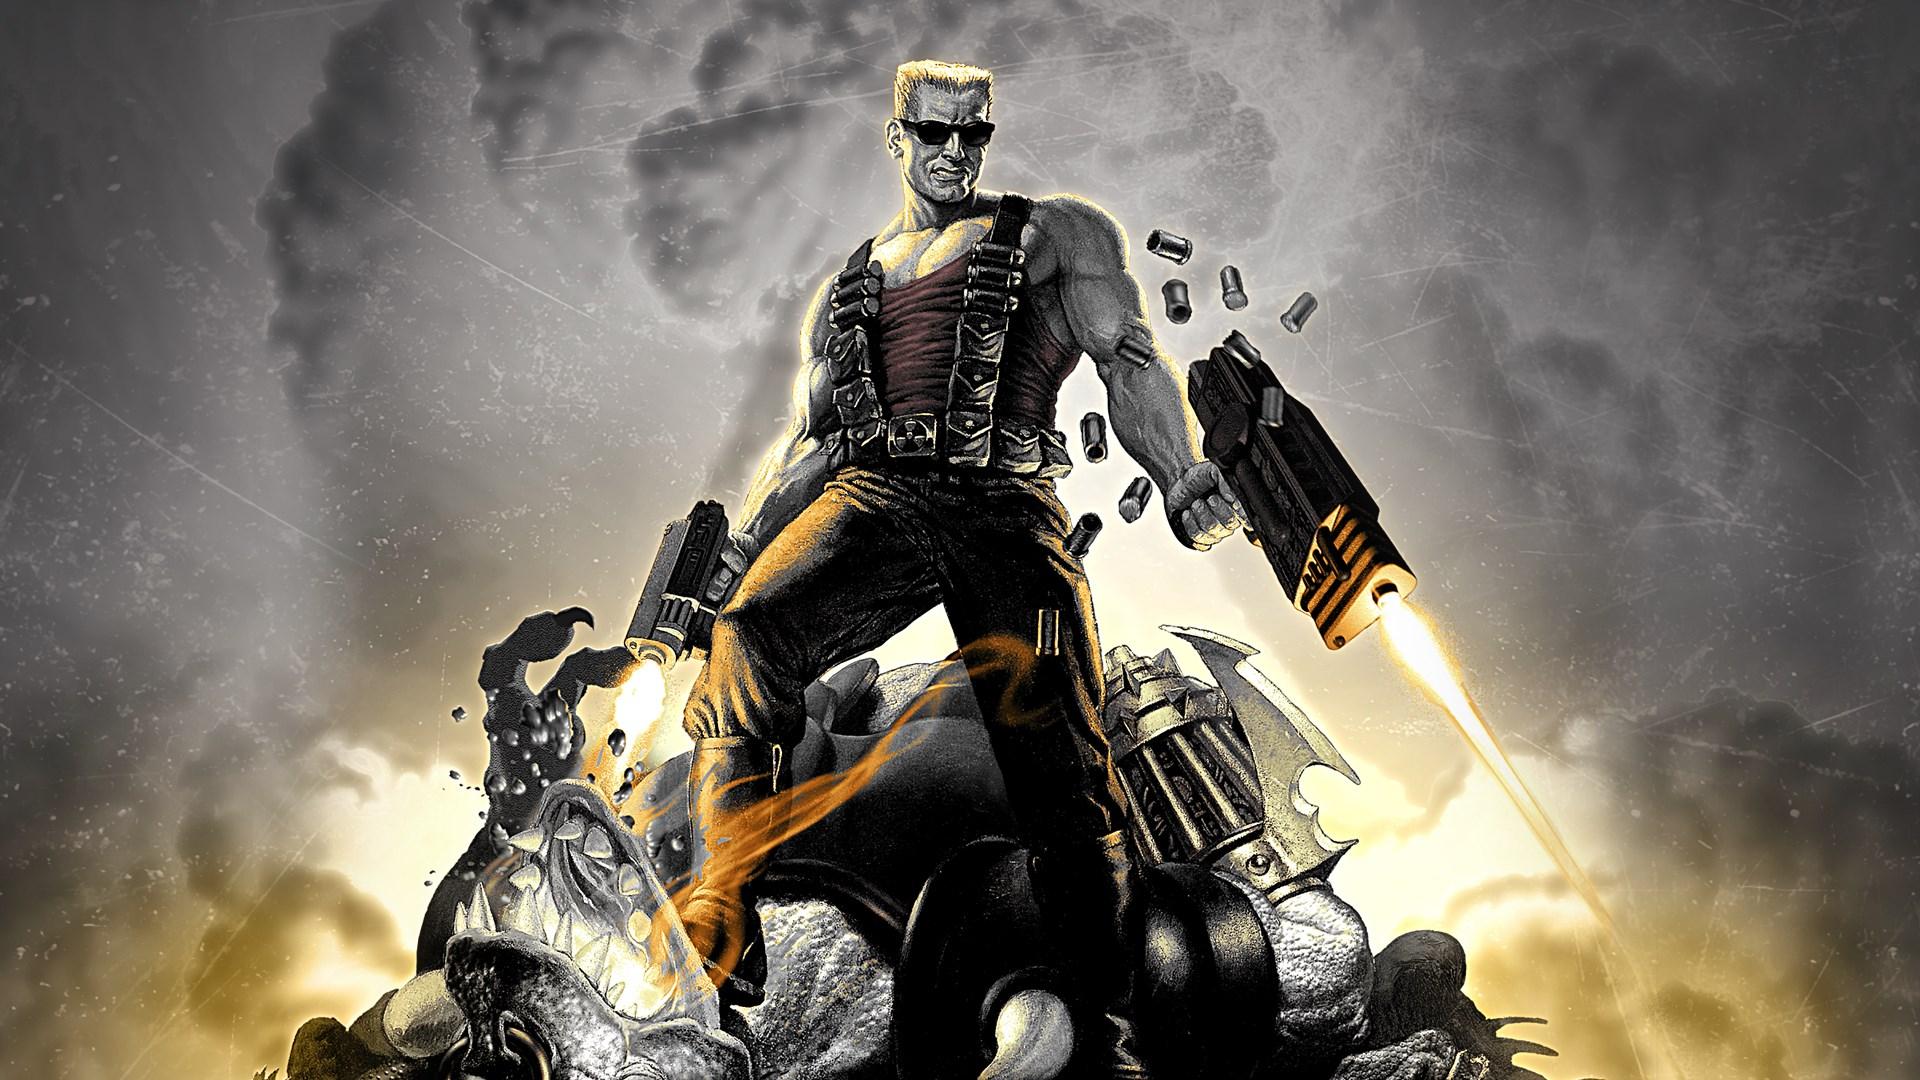 Composer Bobby Prince sues Gearbox, Valve over Duke Nukem 3D music screenshot